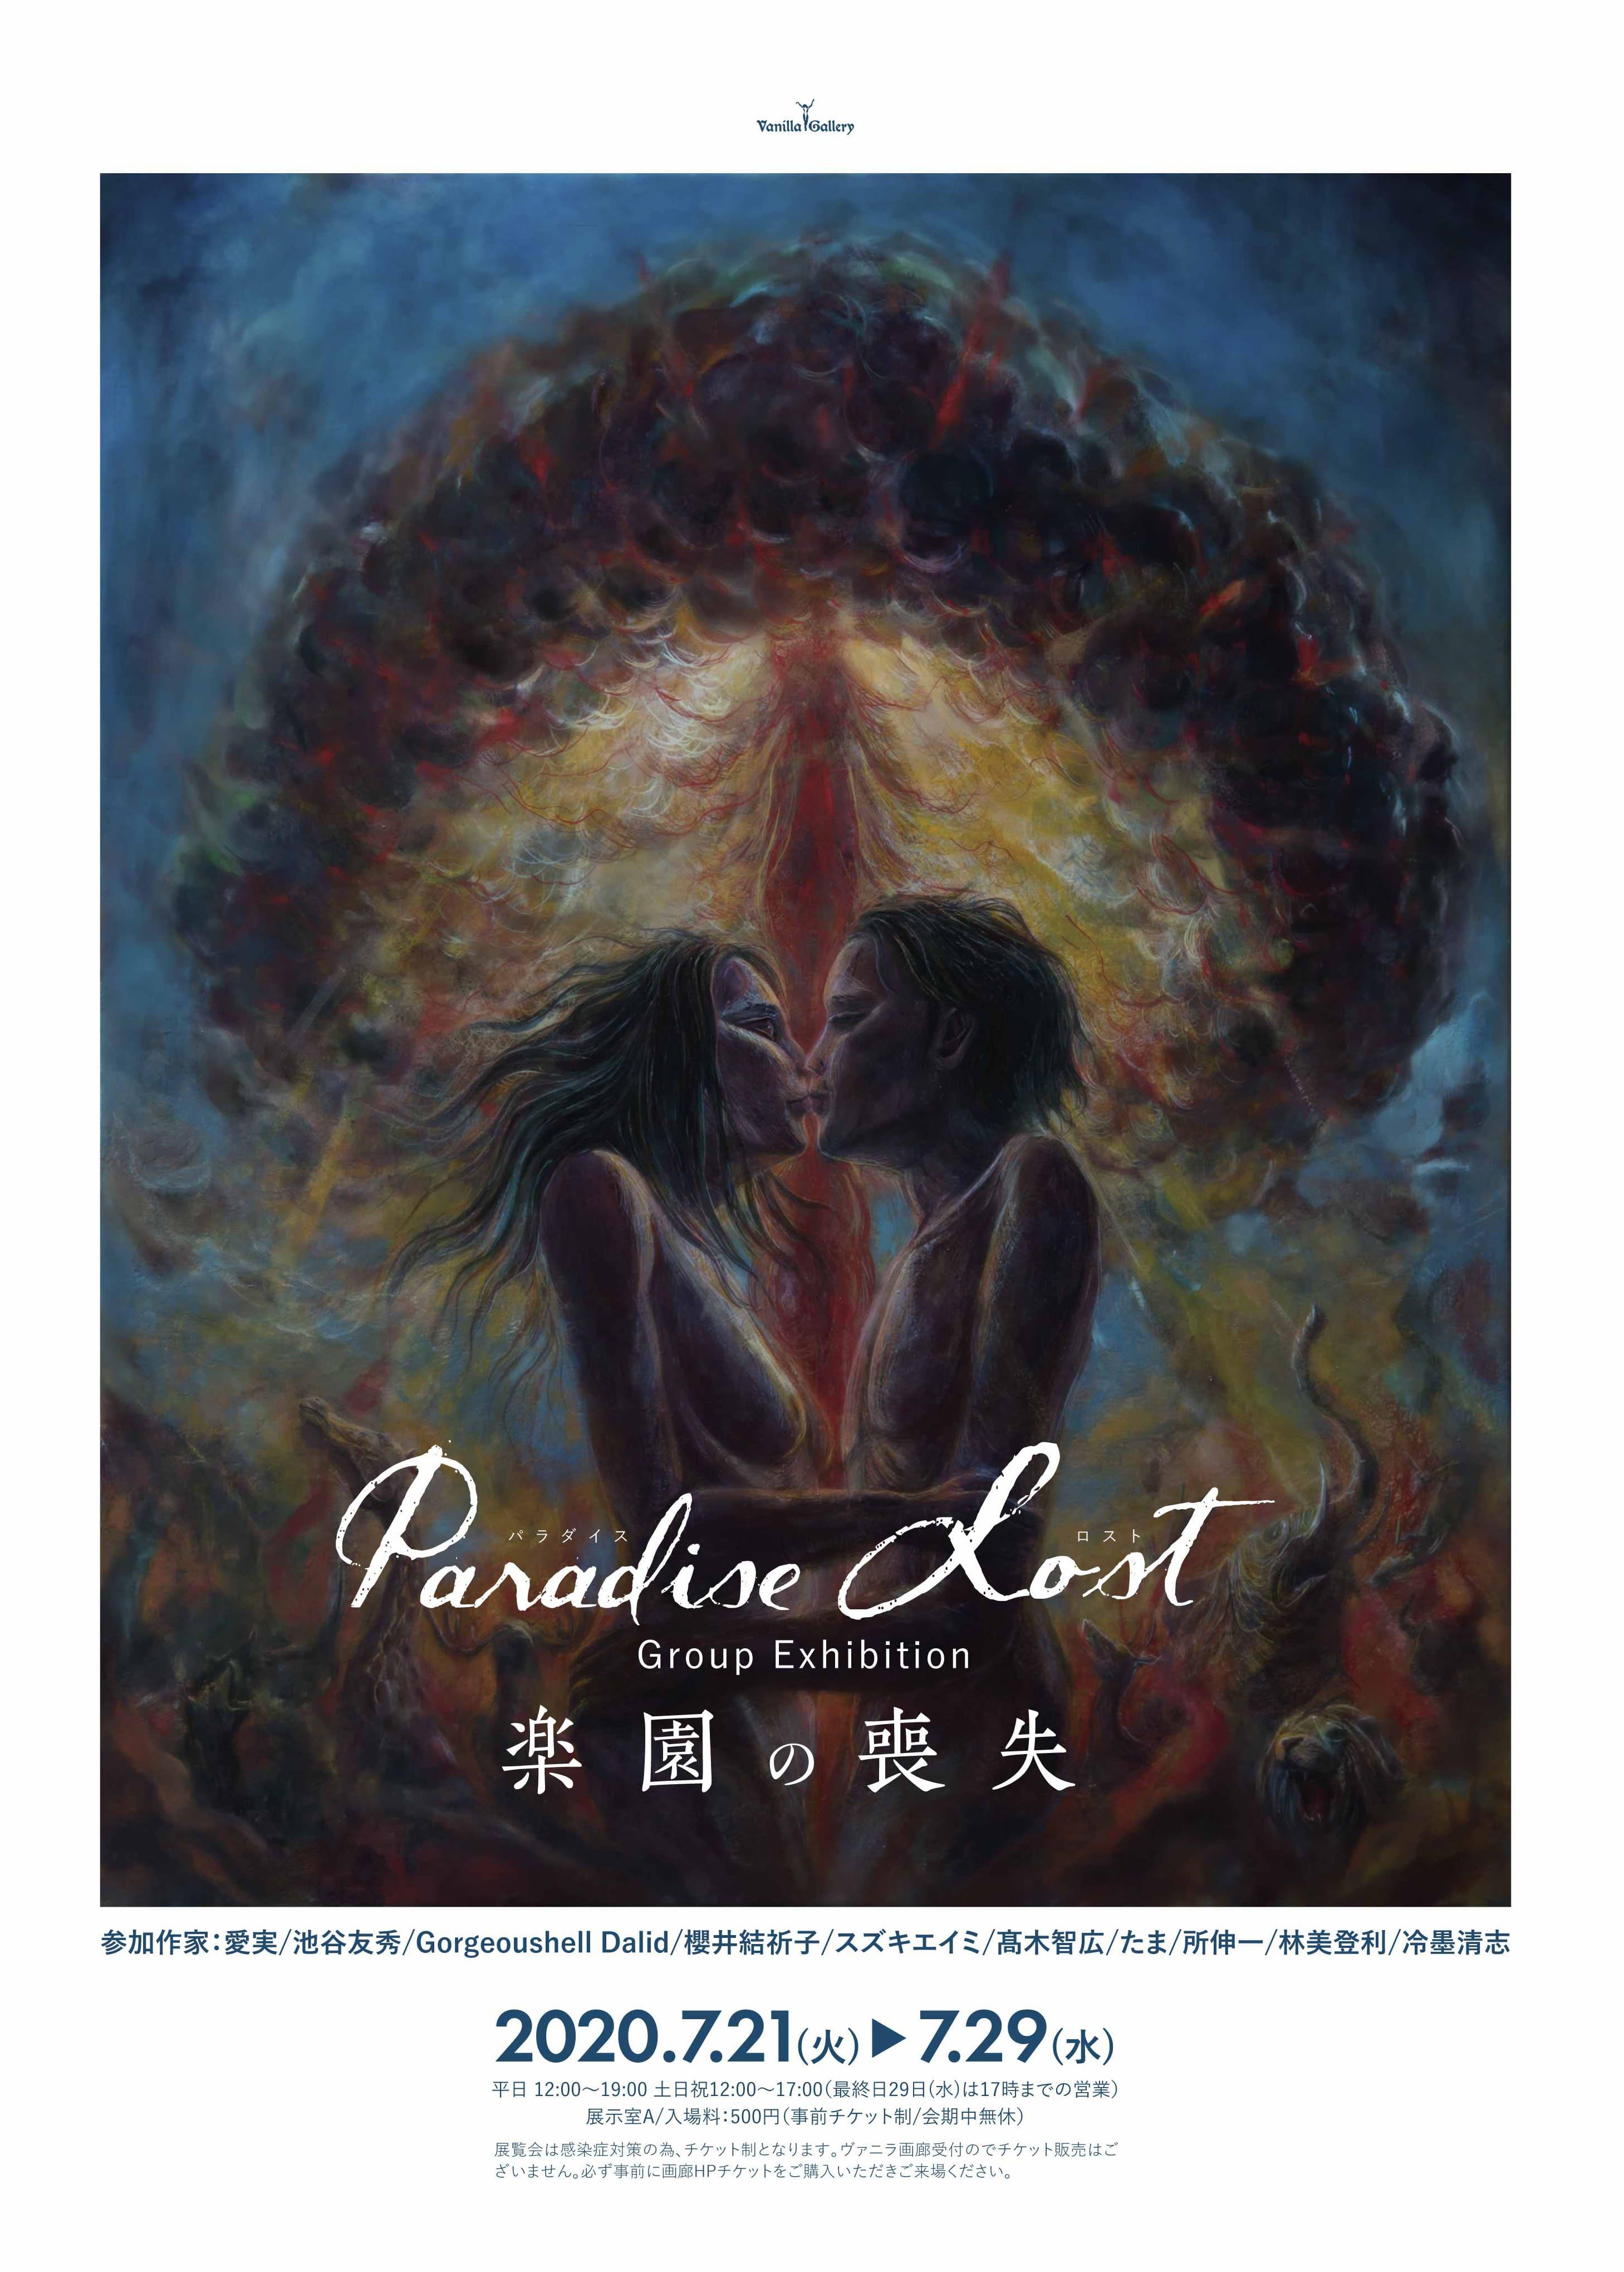 「Paradise Lost ~楽園の喪失~」グループ展 7月22日チケット